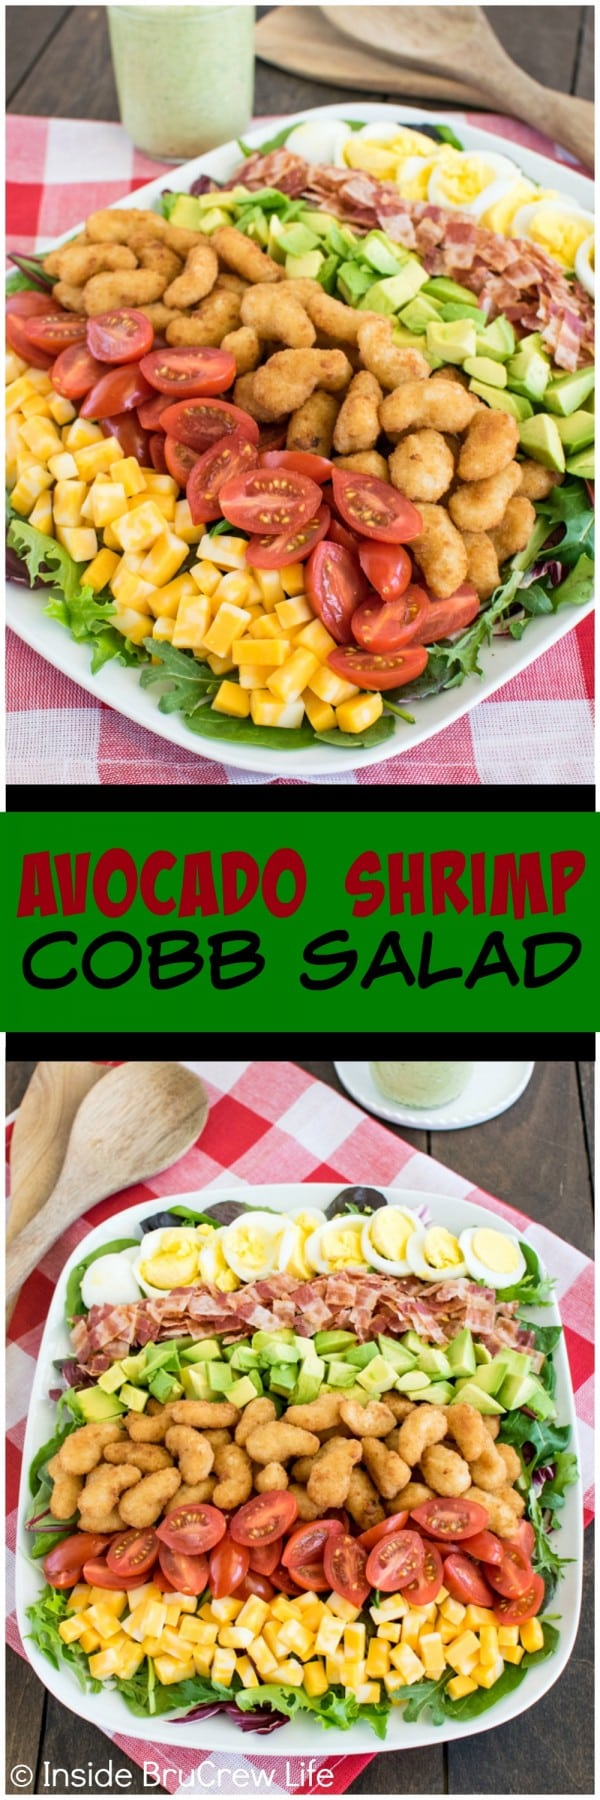 Avocado Shrimp Cobb Salad - layers of shrimp, cheese, and veggies make this easy salad a healthier dinner choice.